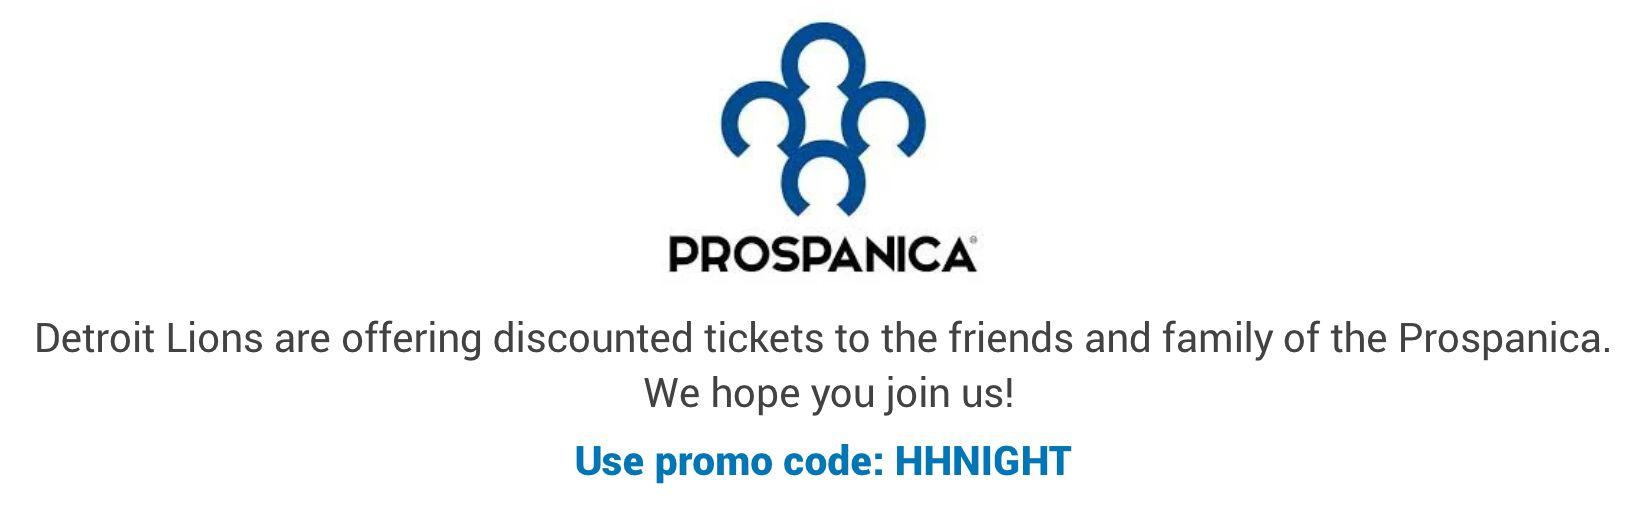 prospanica-header